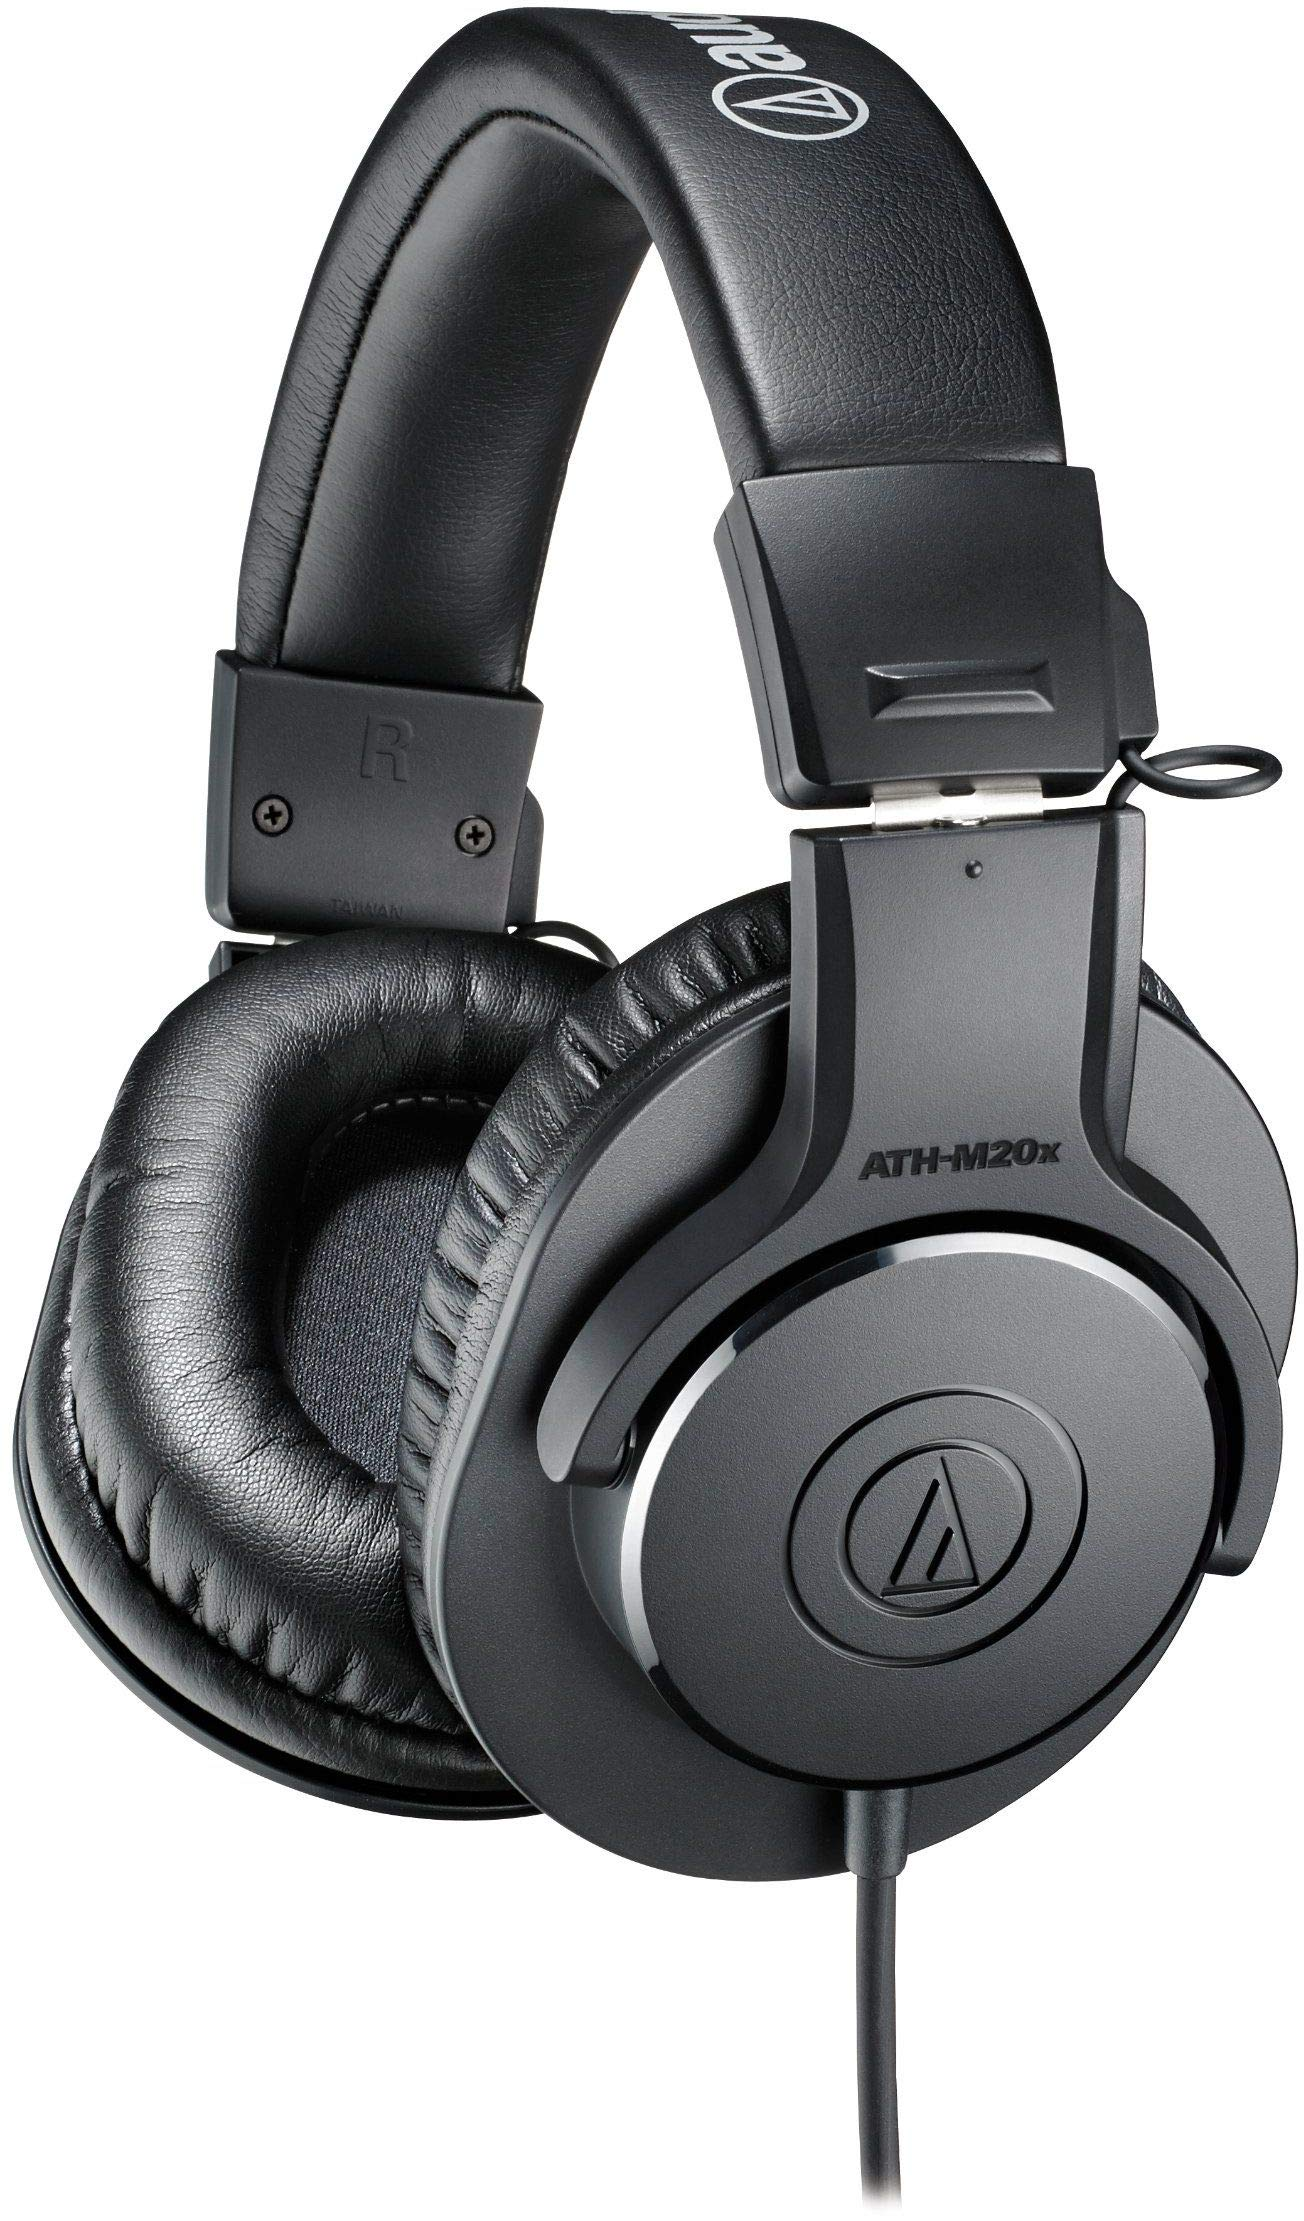 Audio Technica ATH M20x Professional Monitor Headphones